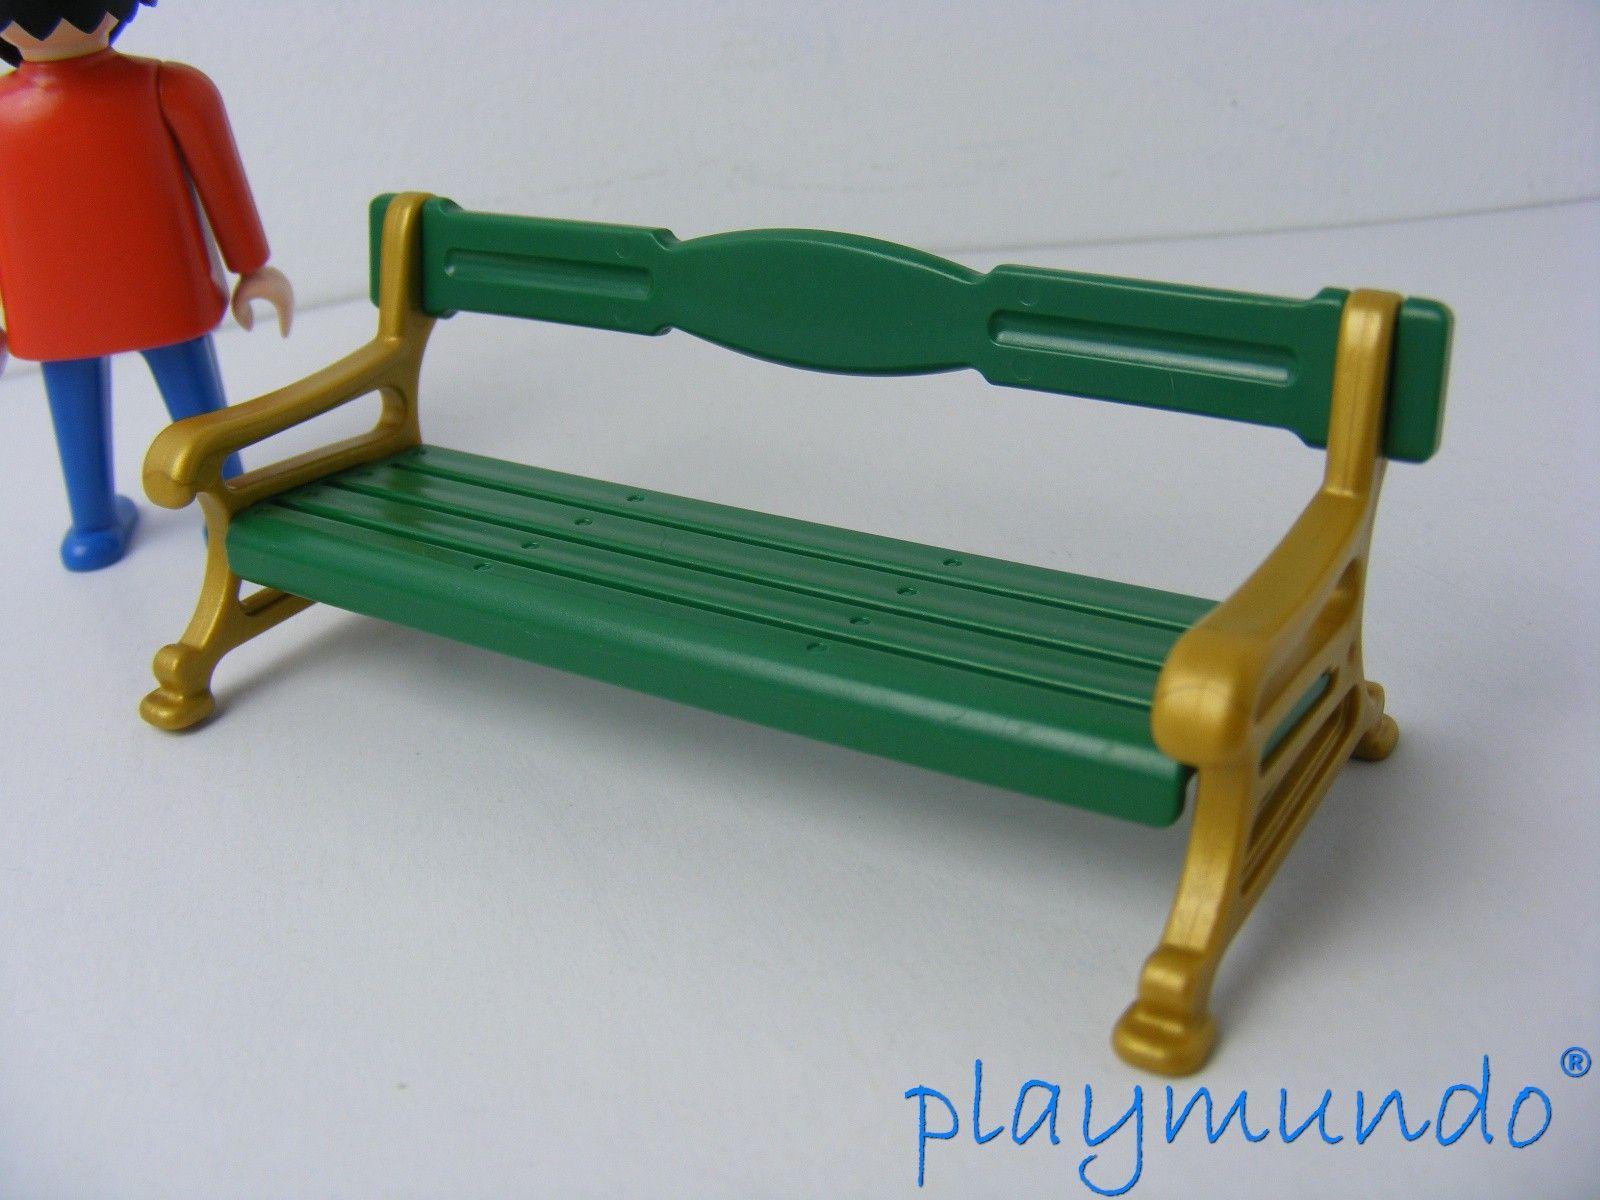 PLAYMOBIL BANCO VICTORIANO PY7780